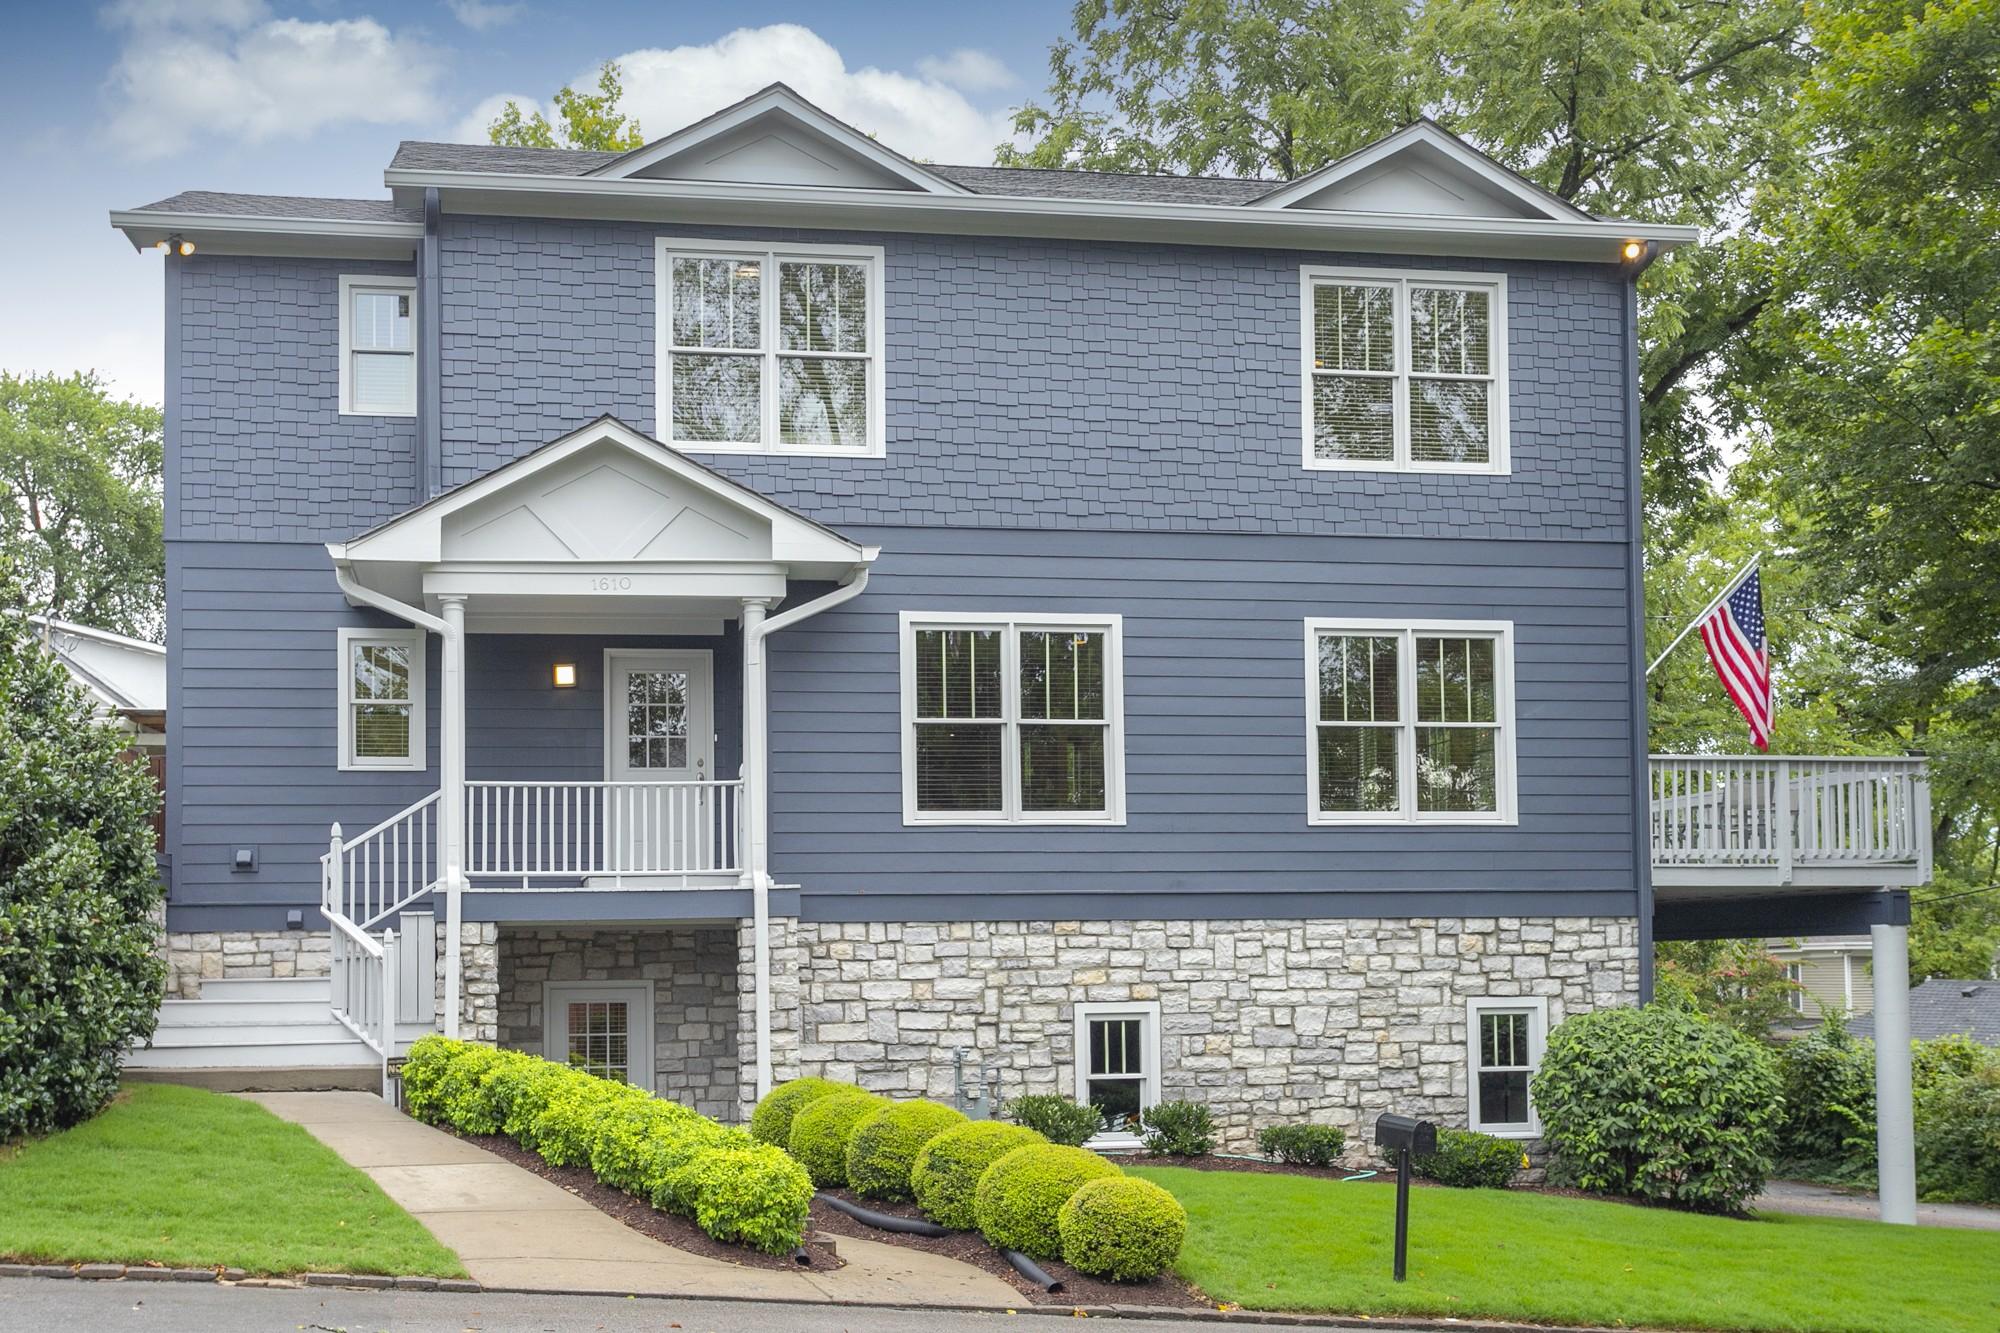 1610 Primrose Ave Property Photo - Nashville, TN real estate listing